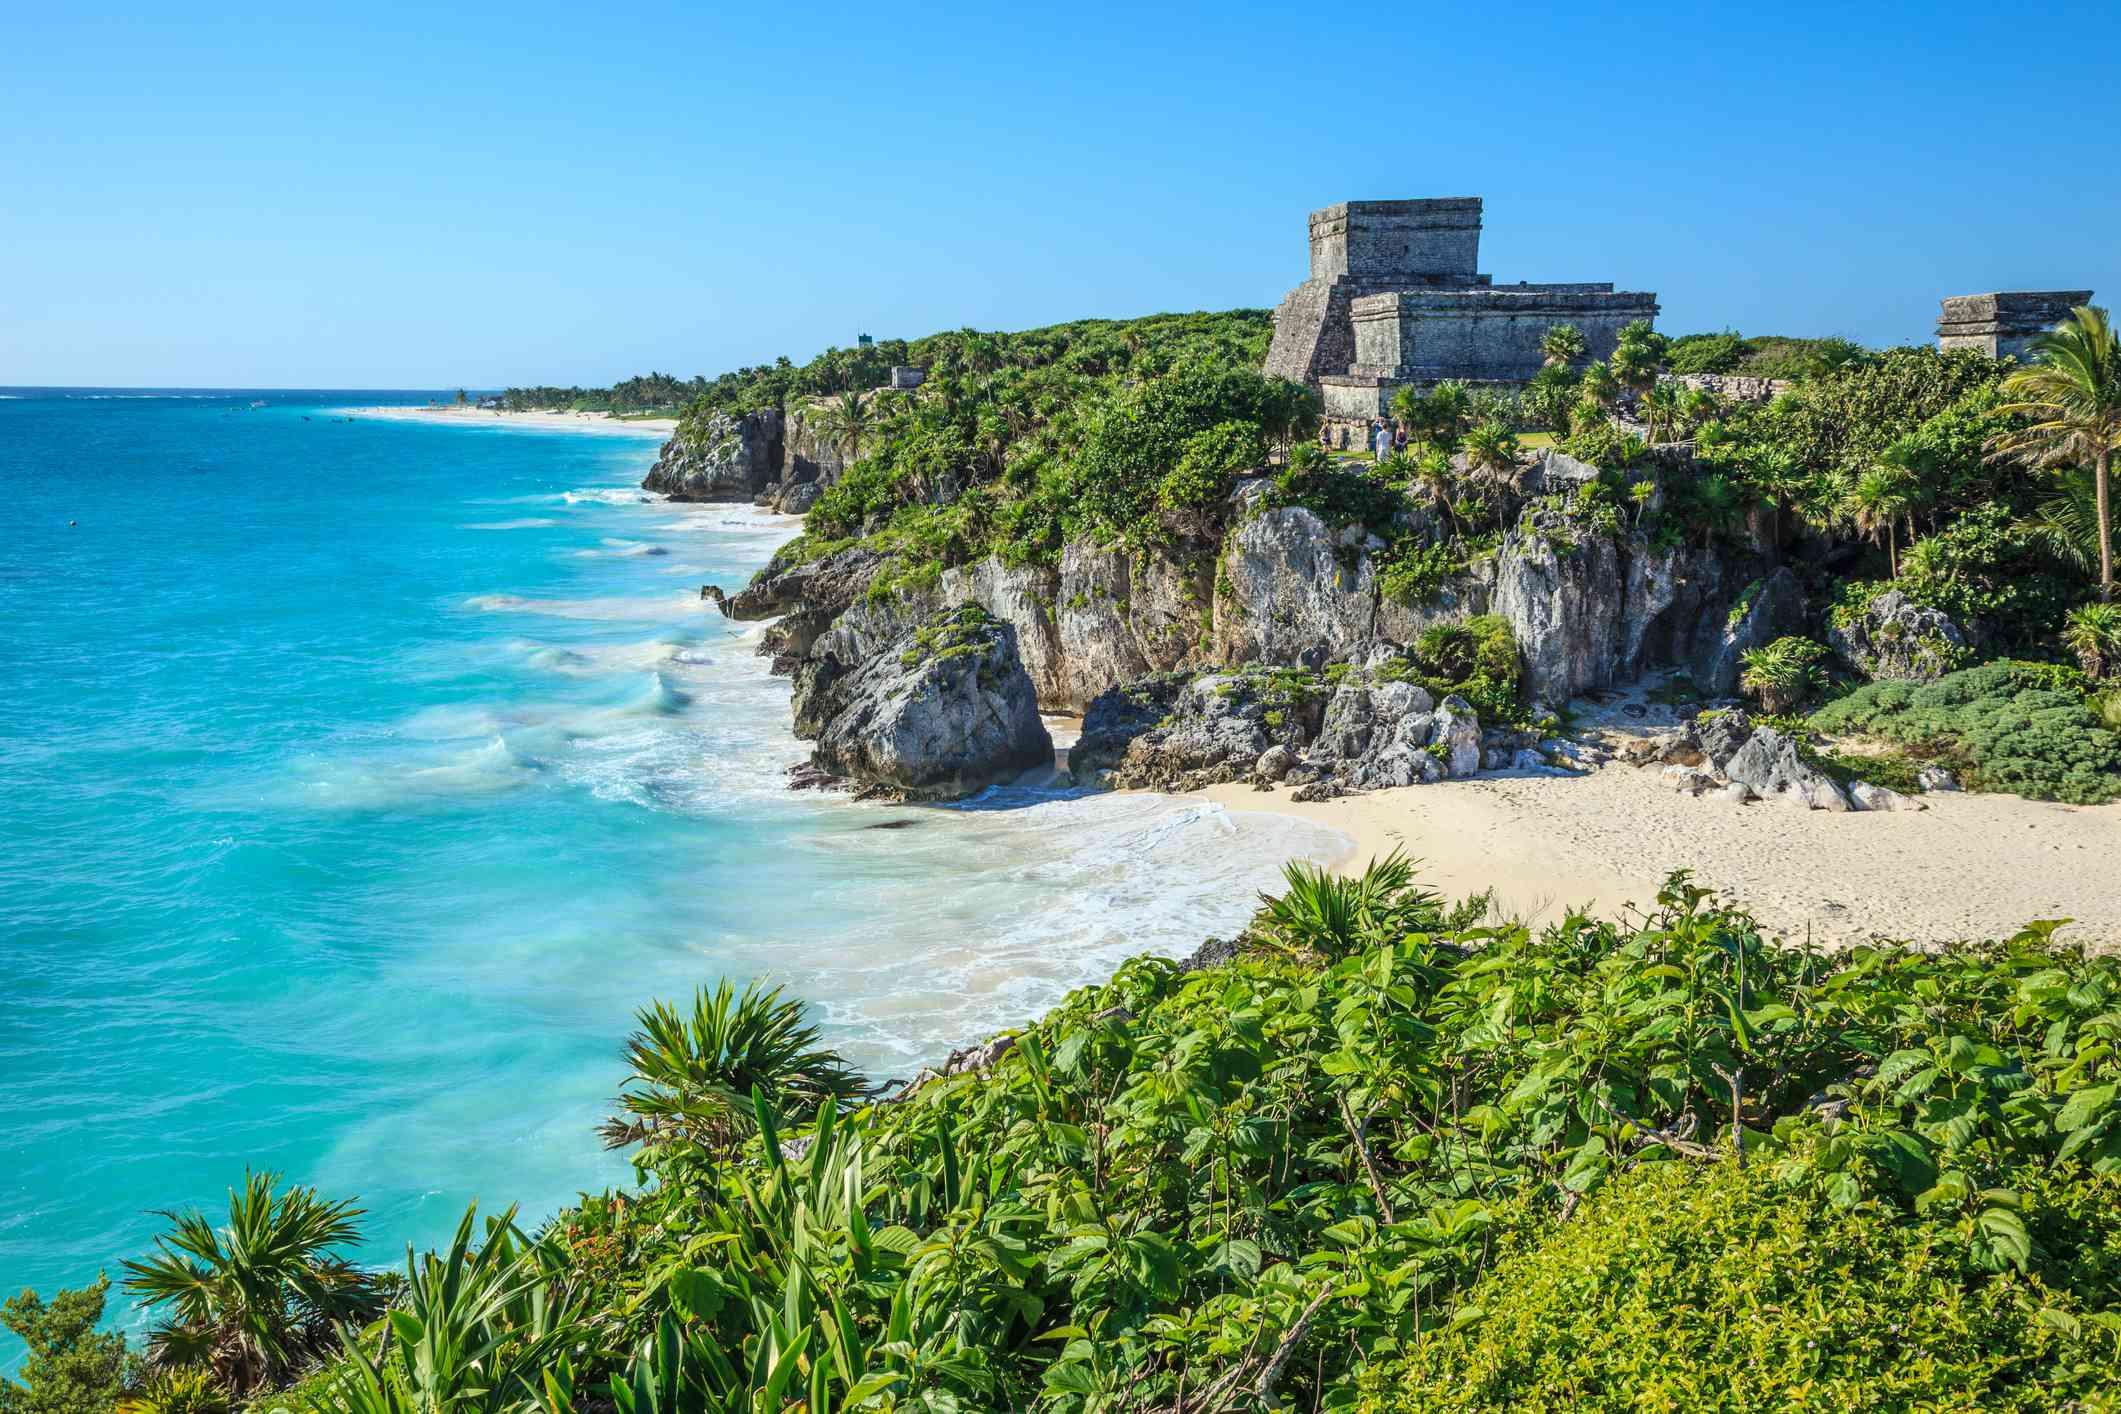 Tulum Mayan Ruins next to Mexican Beach